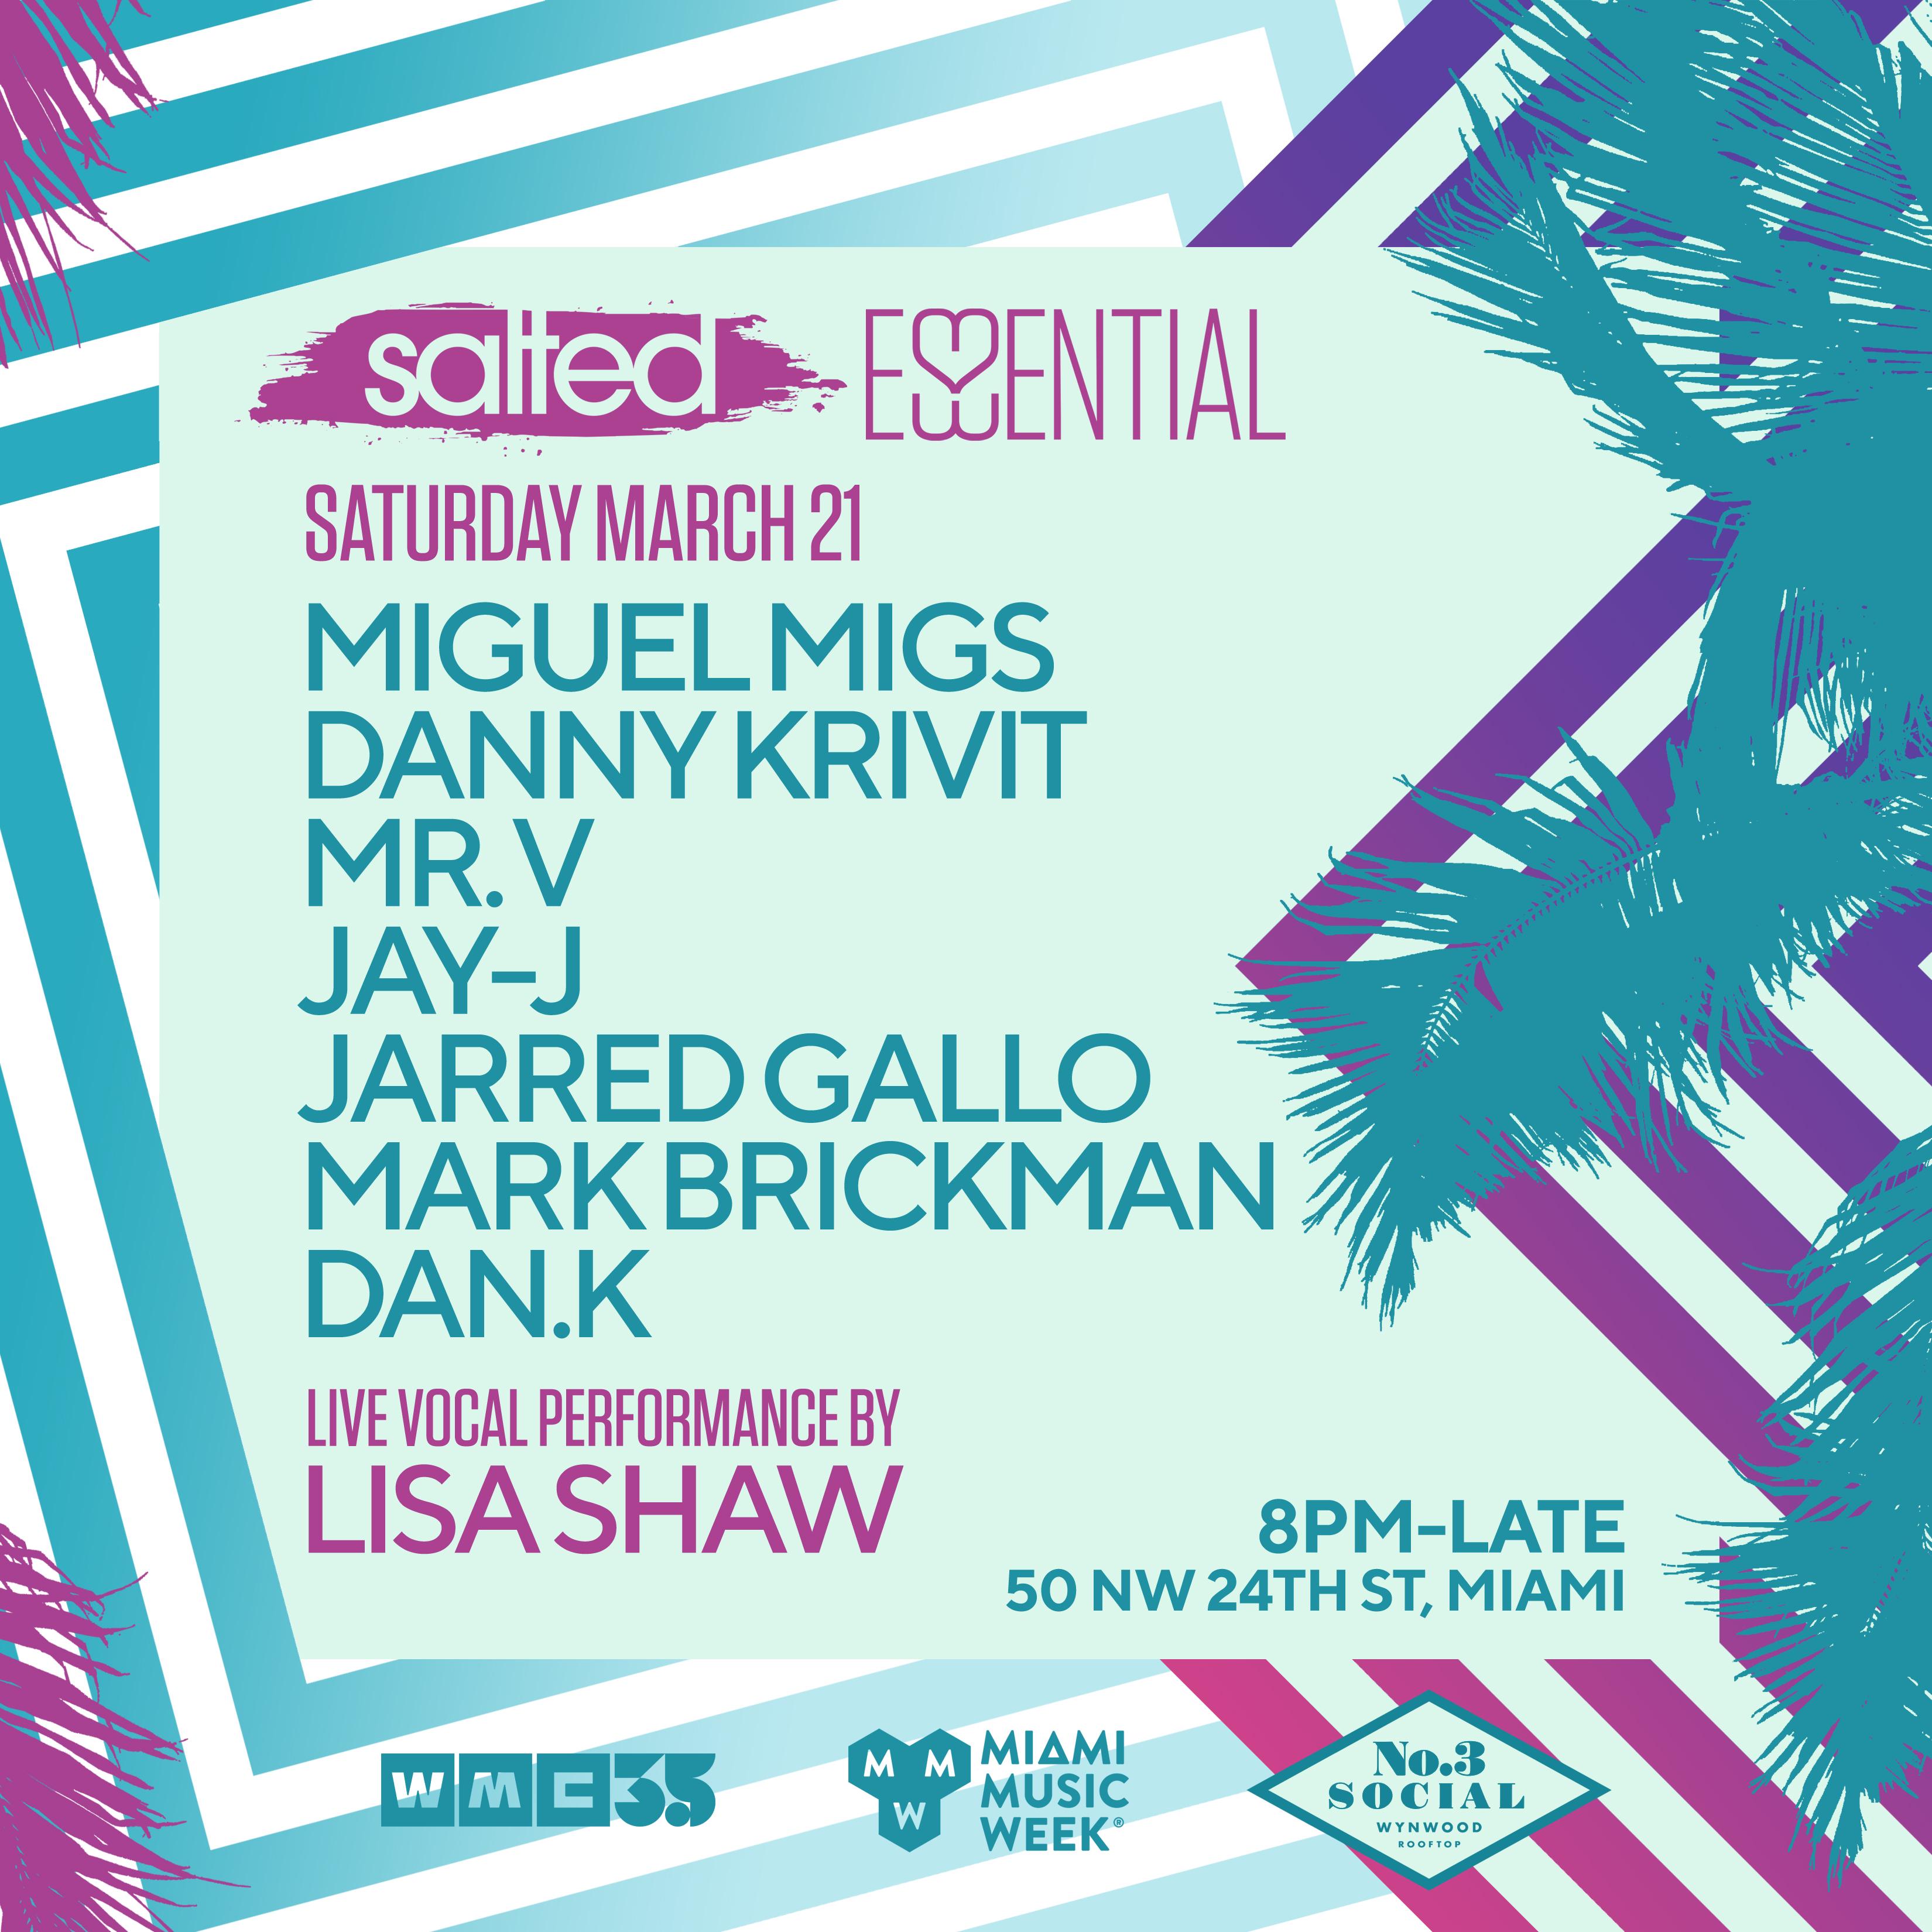 Essential Salted:  Miguel Migs, Danny Krivit, Mr V, Lisa Shaw, Jay-J & more Flyer